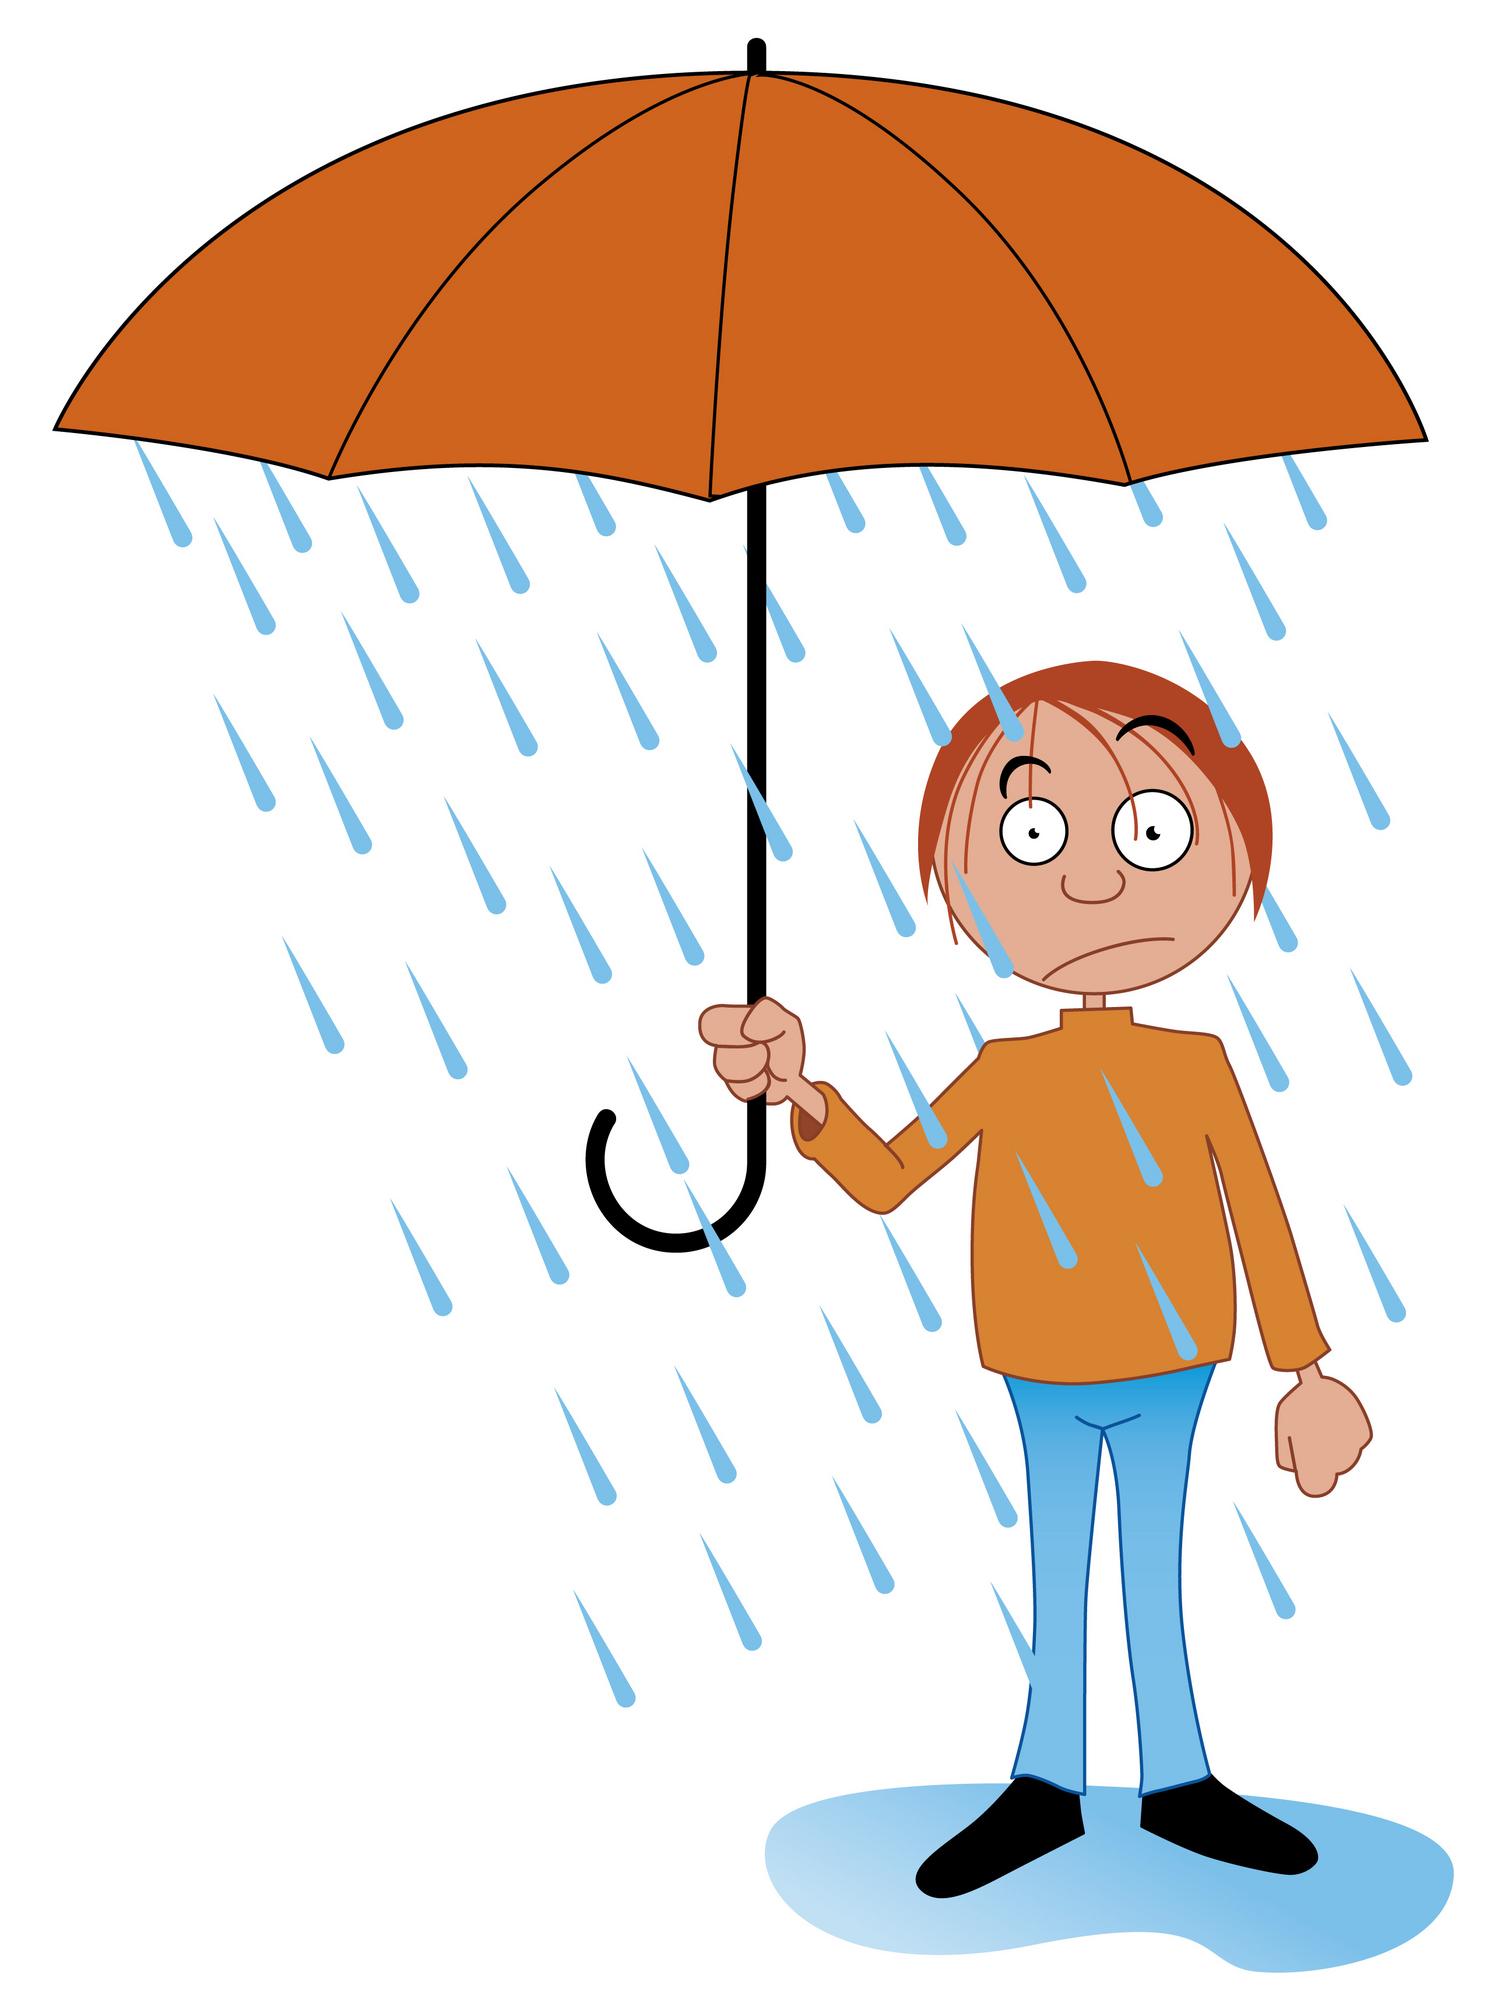 Raining station . Cloudy clipart man in rain